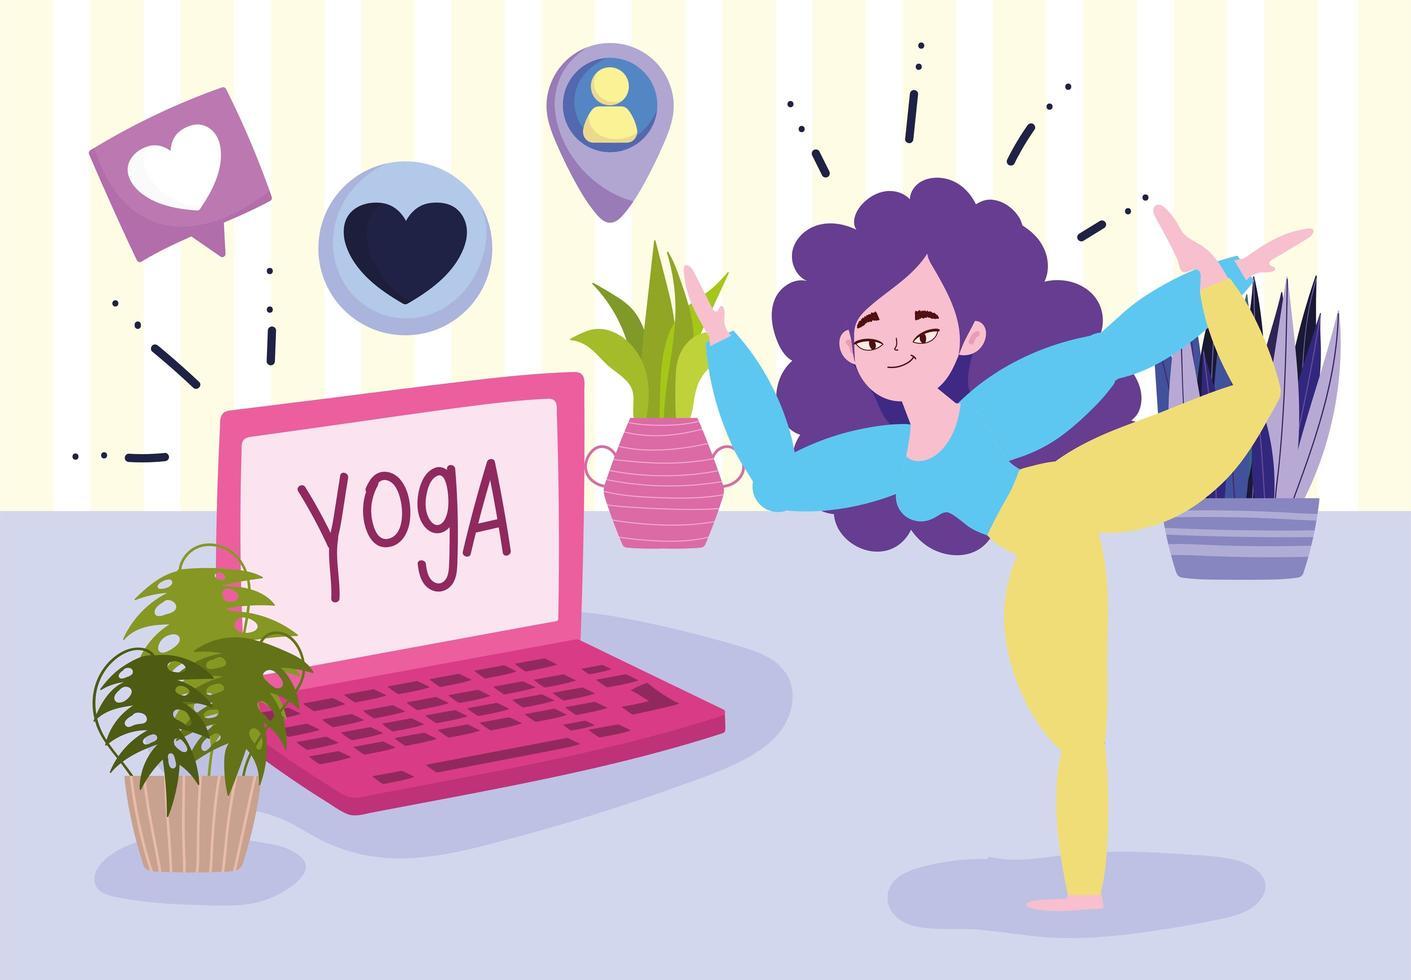 junge Frau im Yoga-Pose-Laptop im Raum vektor